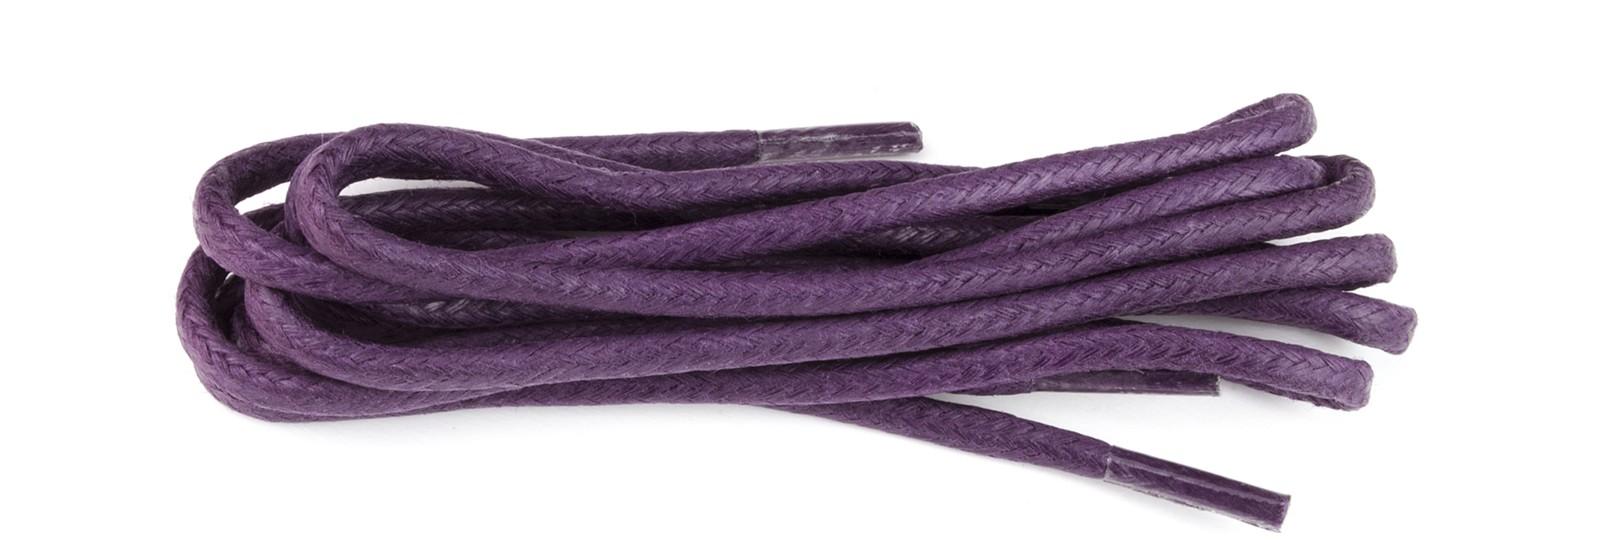 Purple Wax Polished Fine Round Laces